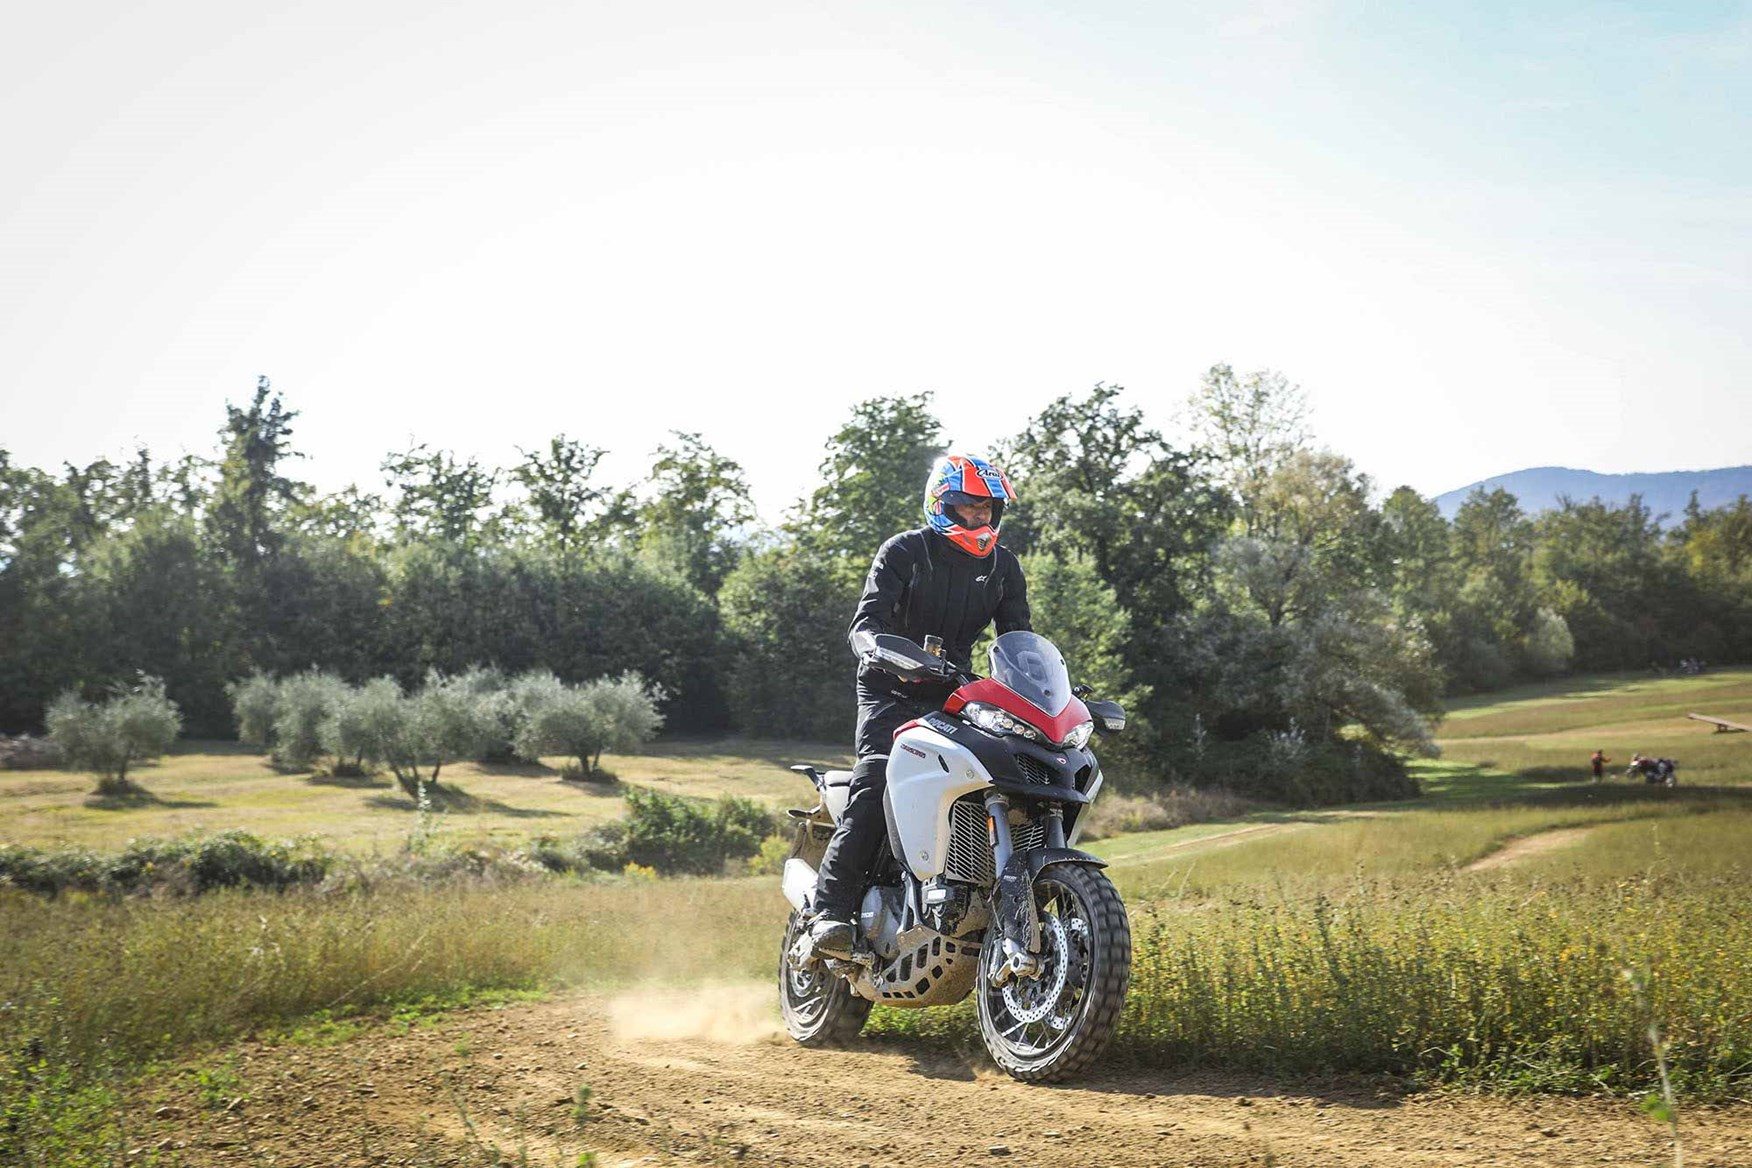 Ducati Multistrada 1260 Enduro 2019 On Review